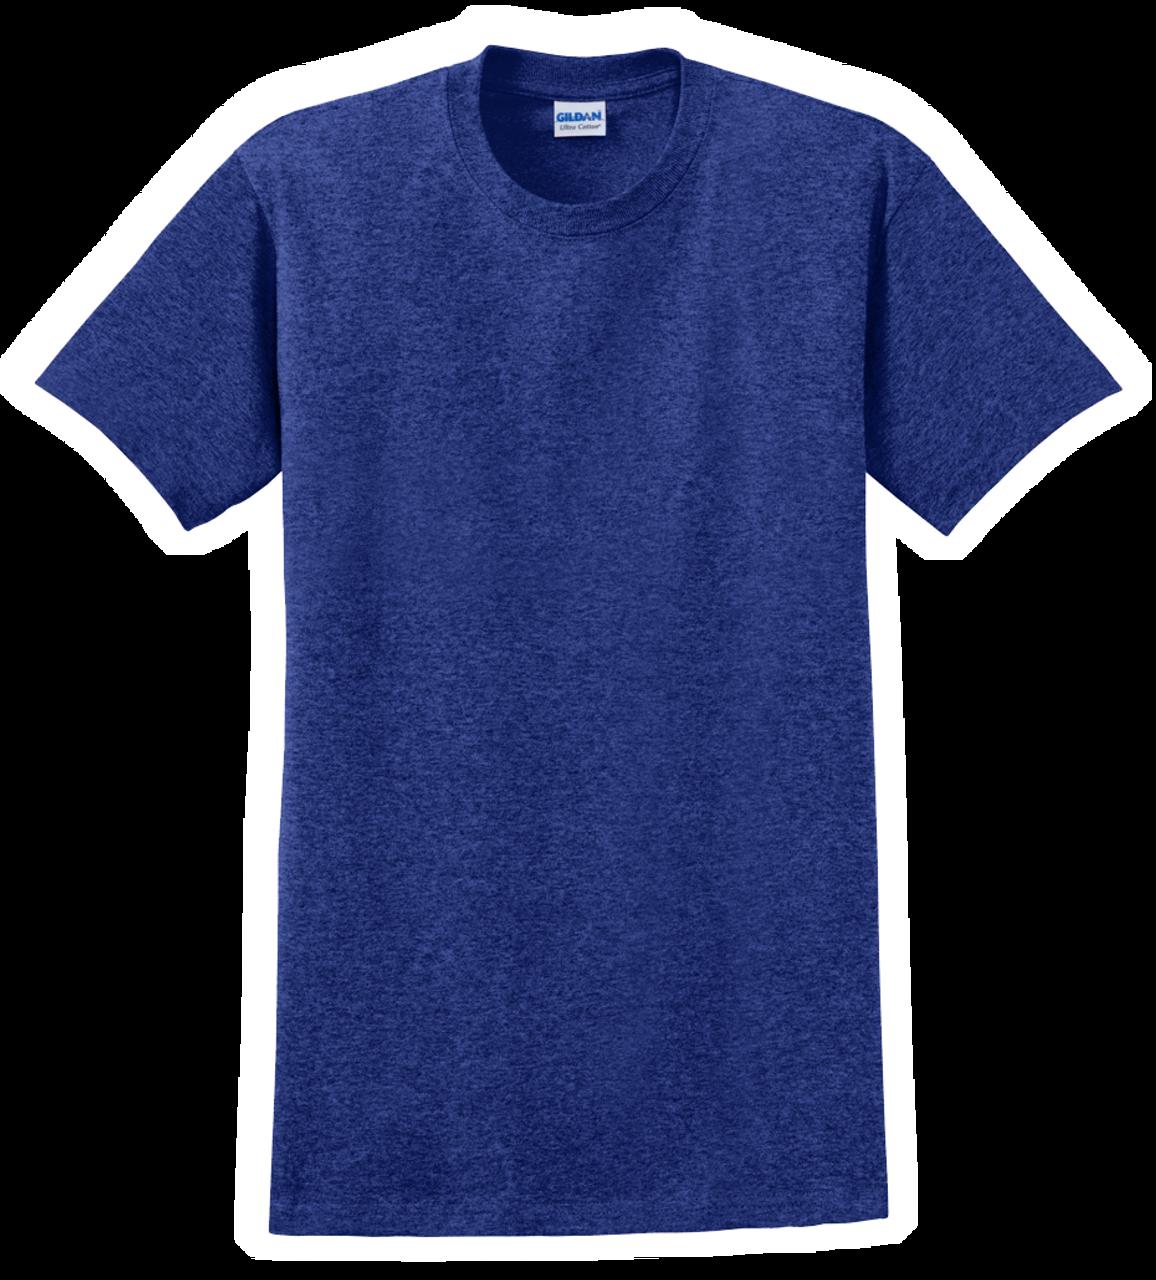 G2000 Antique Royal T-Shirt Short Sleeve by Gildan